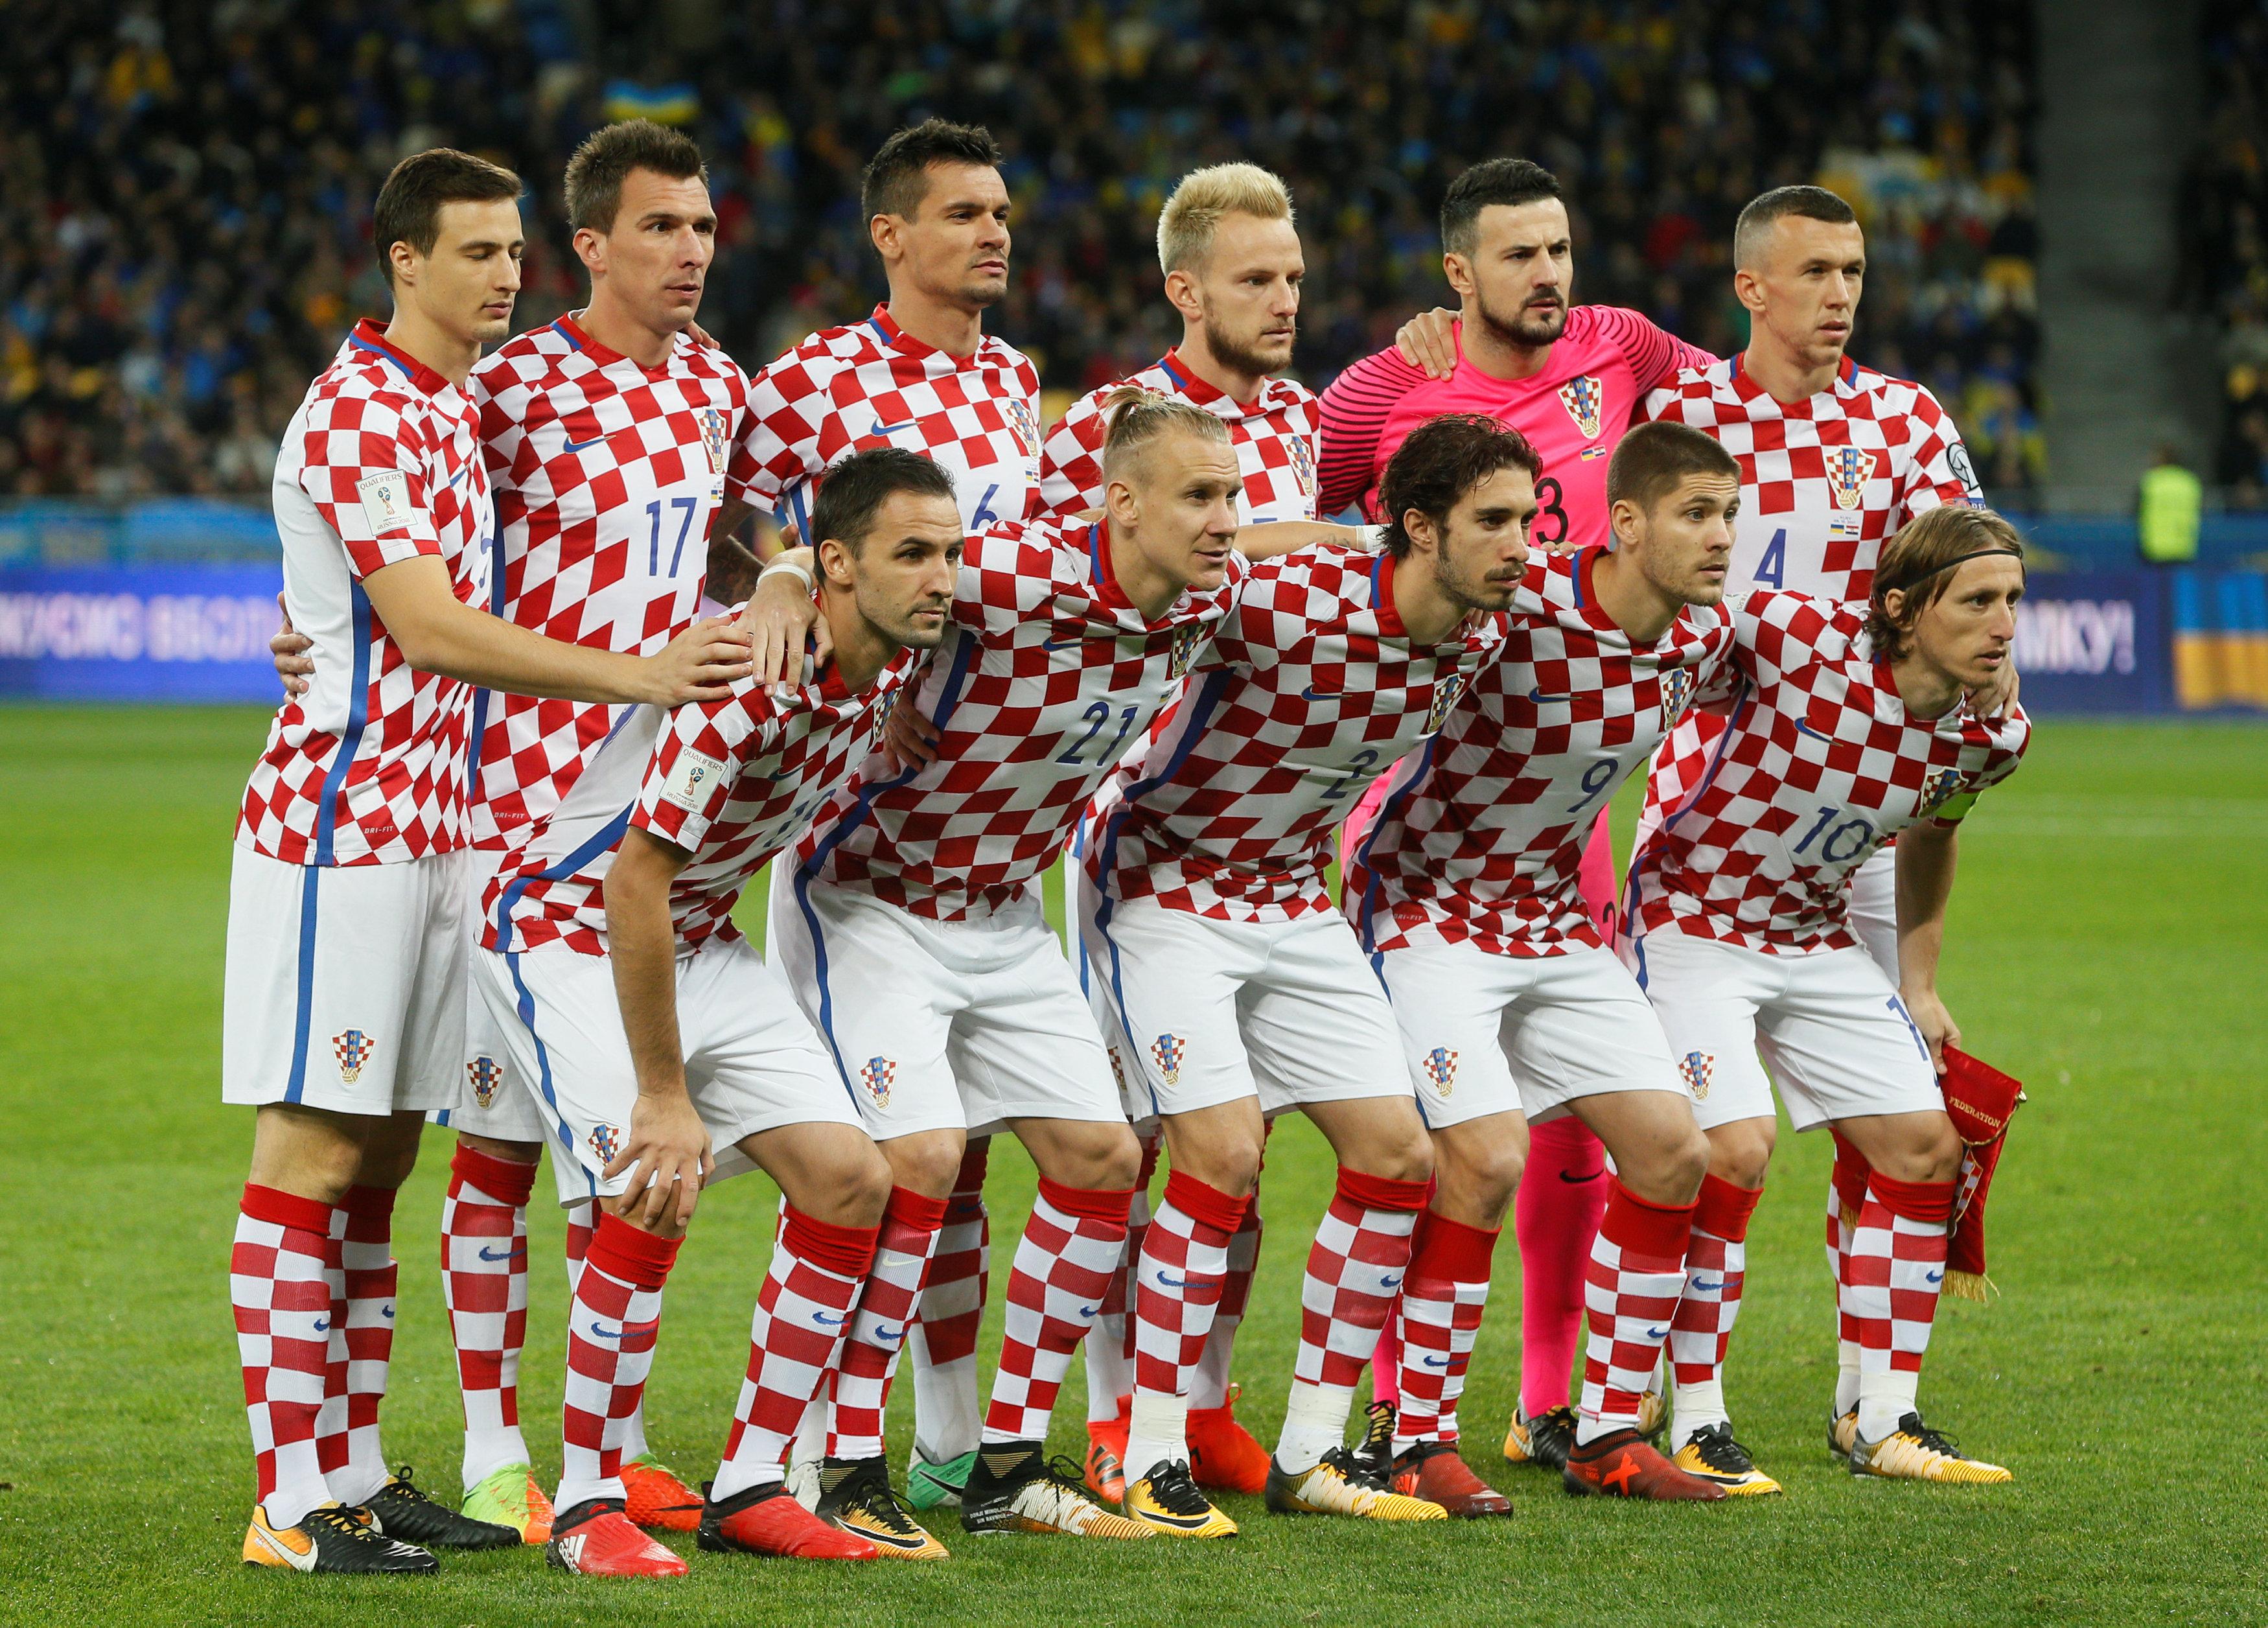 2017-10-09T194216Z_108349926_RC1E4F026B90_RTRMADP_3_SOCCER-WORLDCUP-UKR-CRO